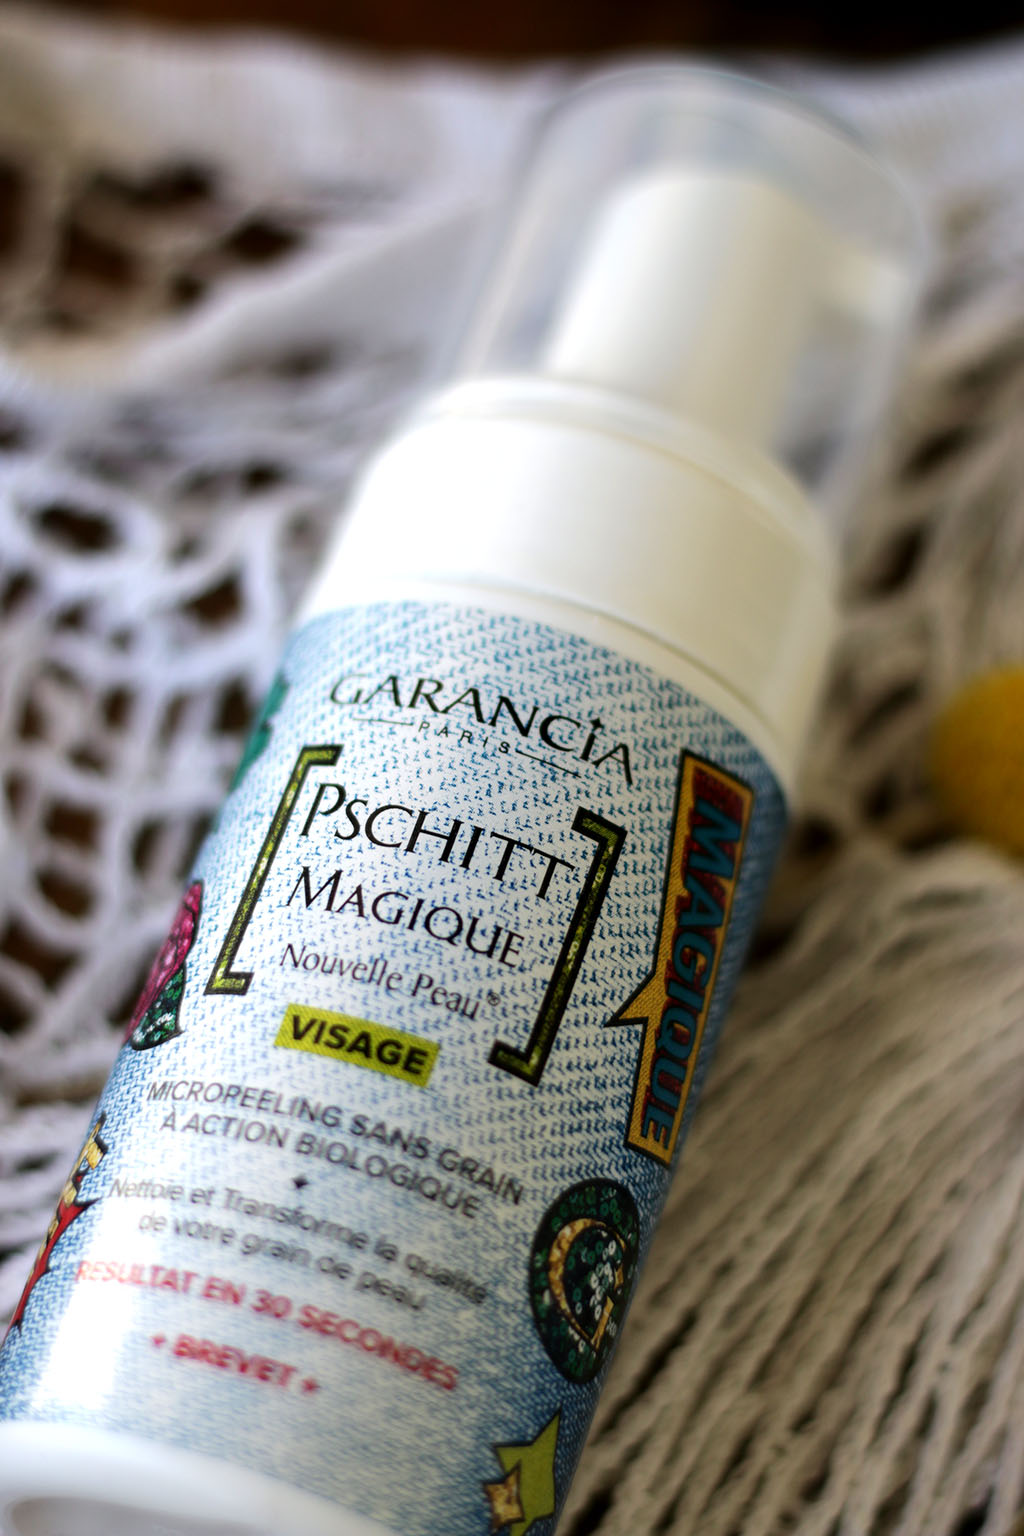 pschitt magique de garancia